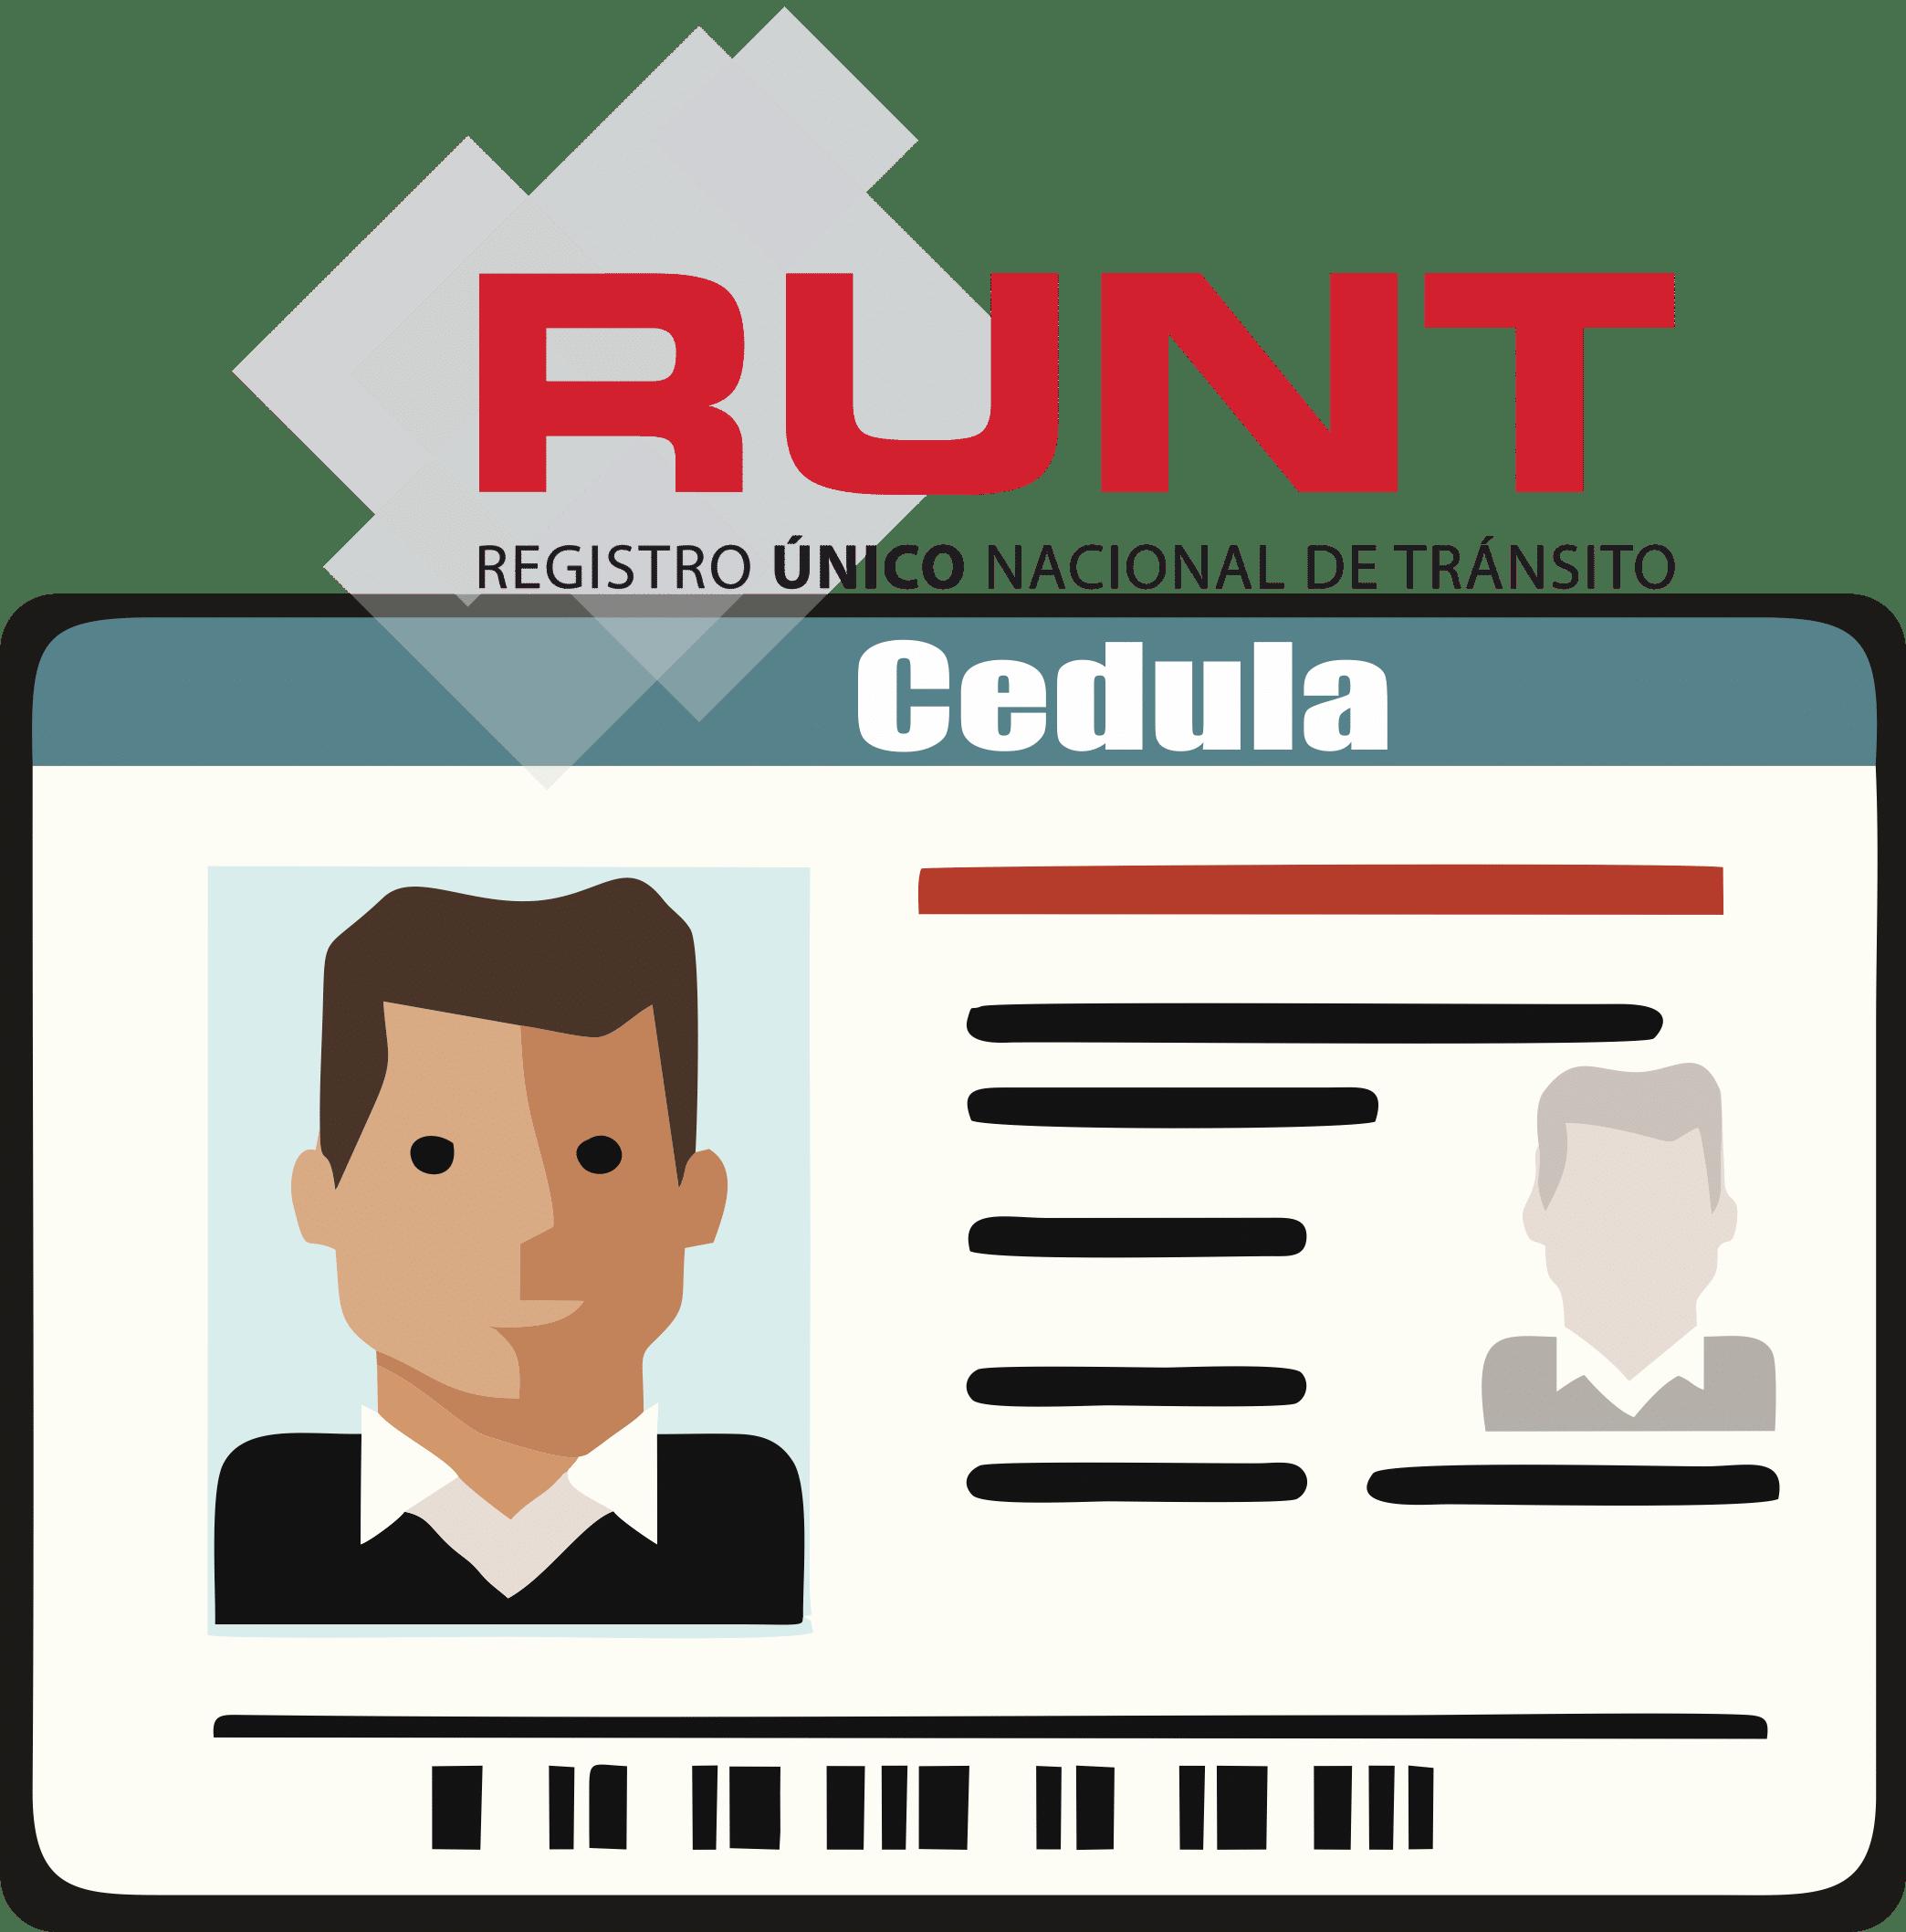 CONSULTAR RUNT CÉDULA